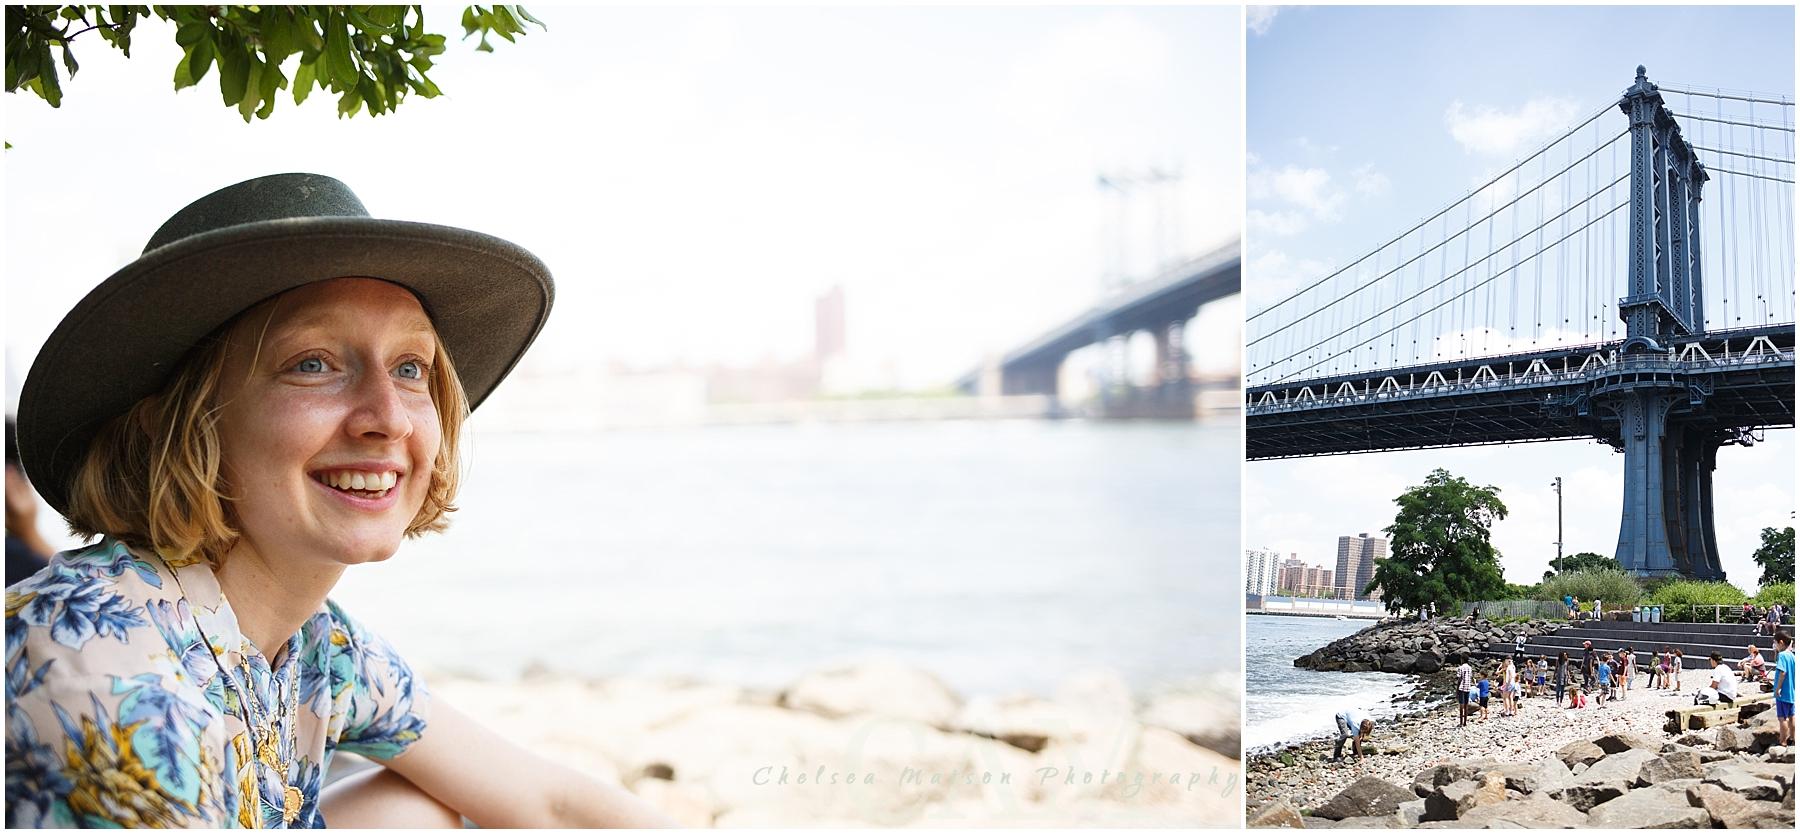 Summer Day - Chelsea Matson Photography